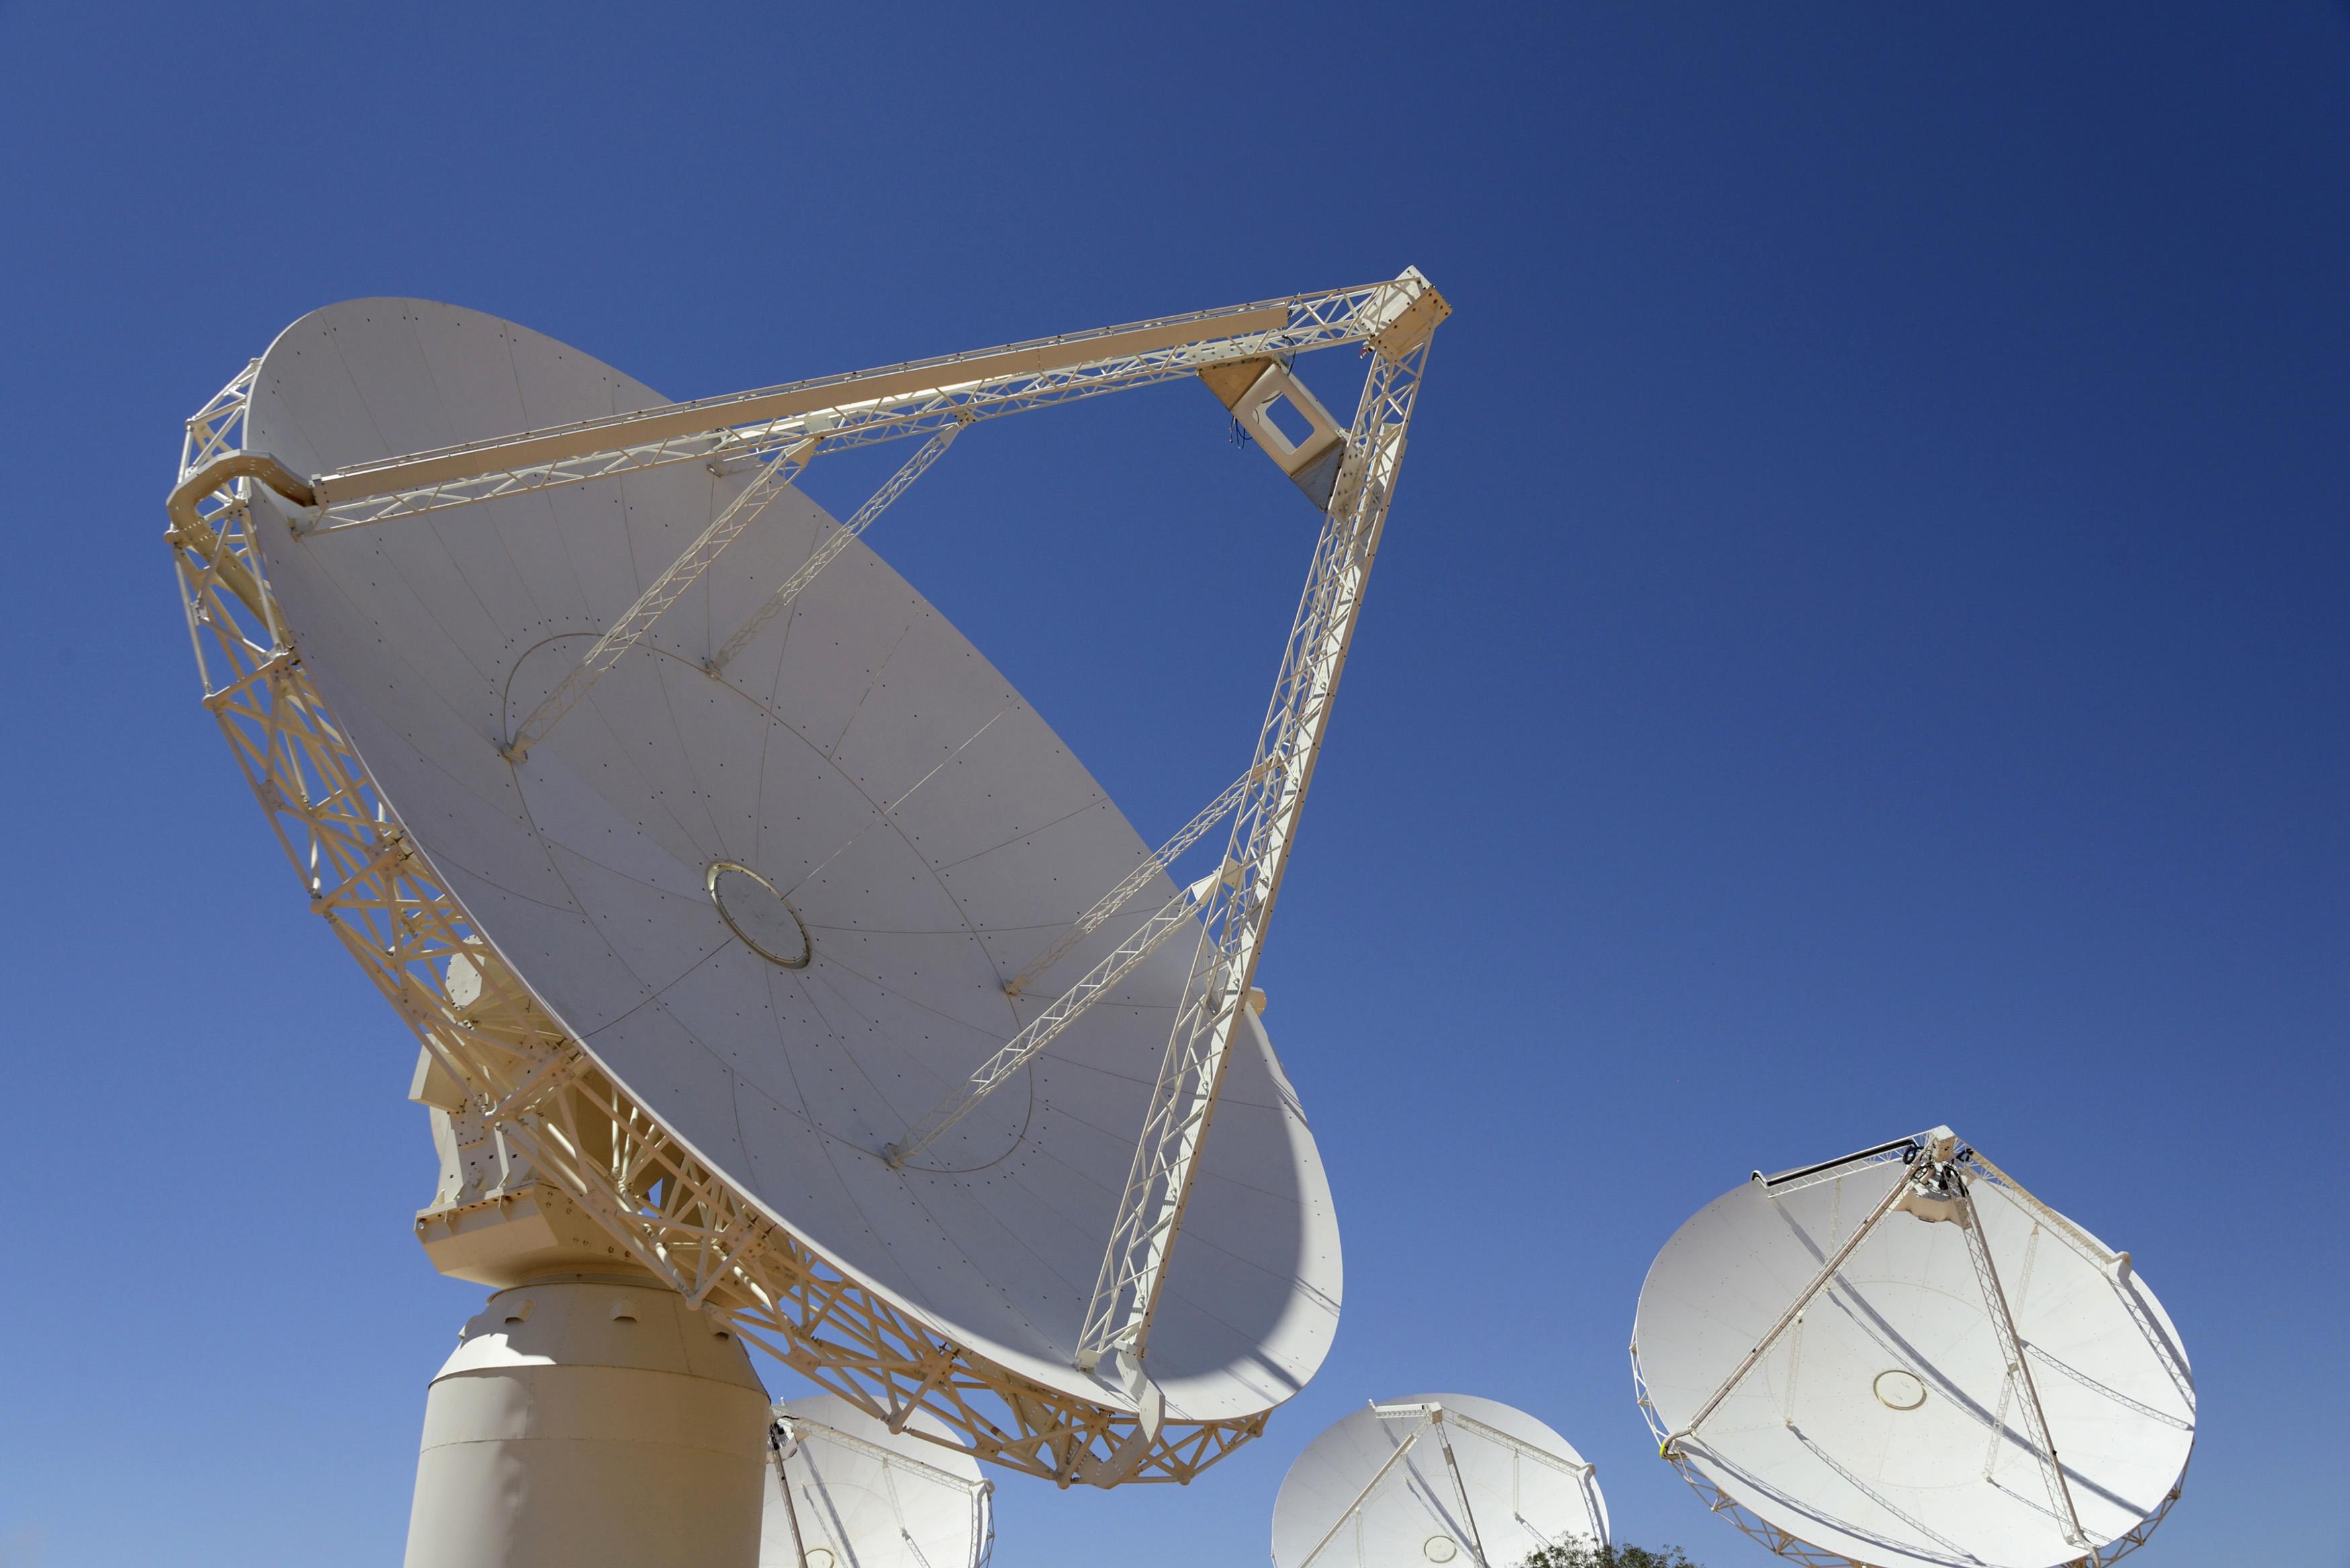 Australian telescope maps 3 million galaxies in just 300 hours - Aljazeera.com